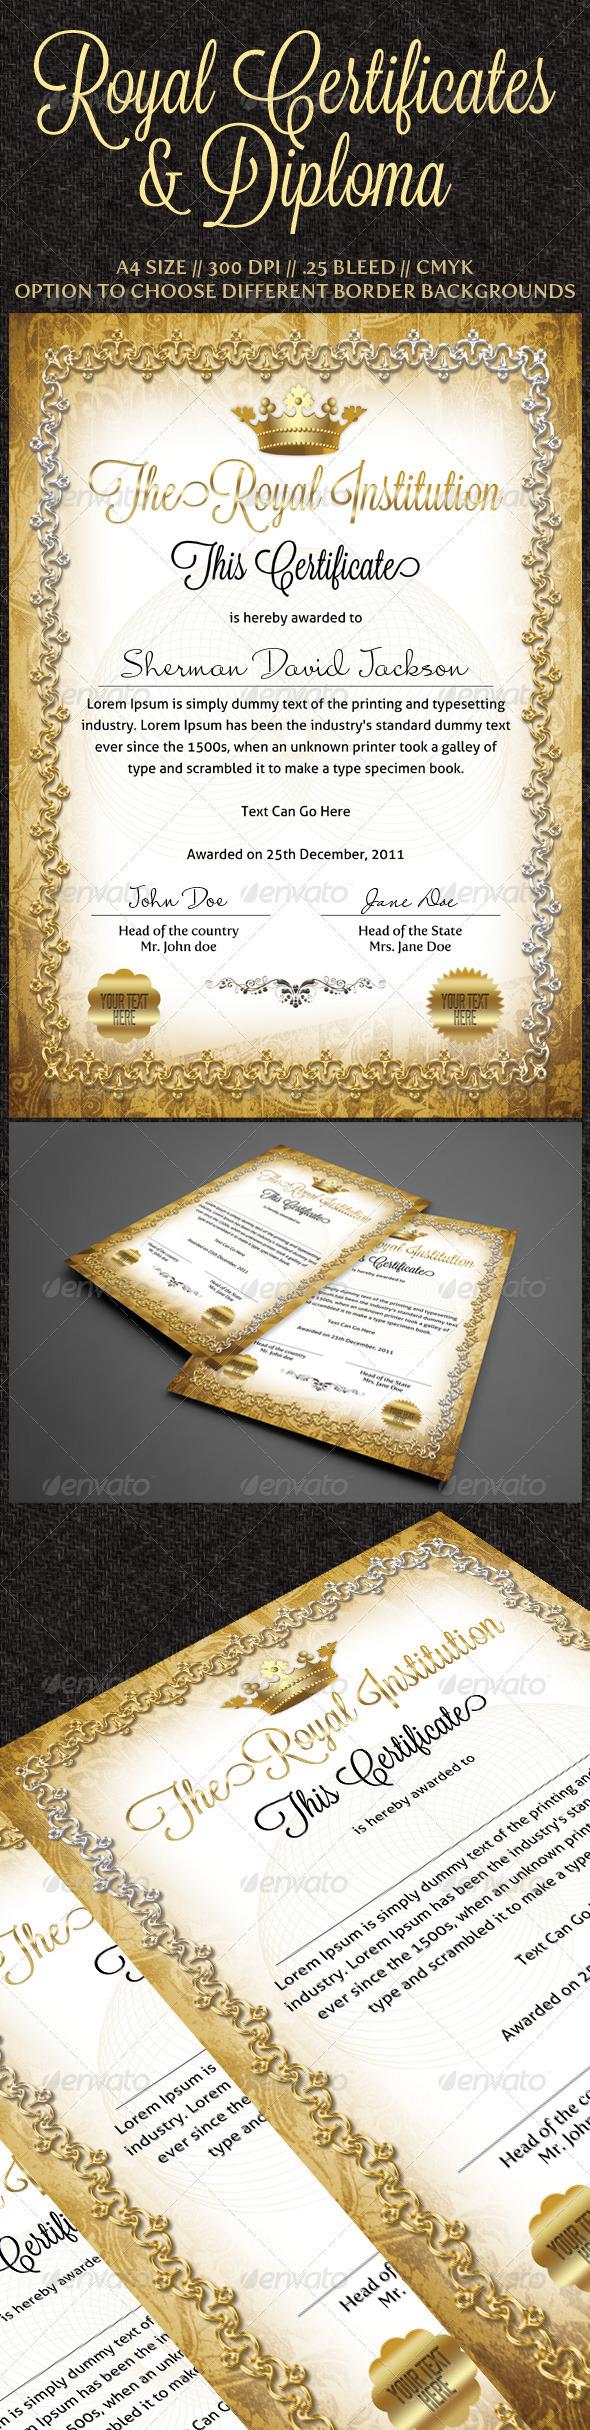 Download Royal Certificates Print Design Template